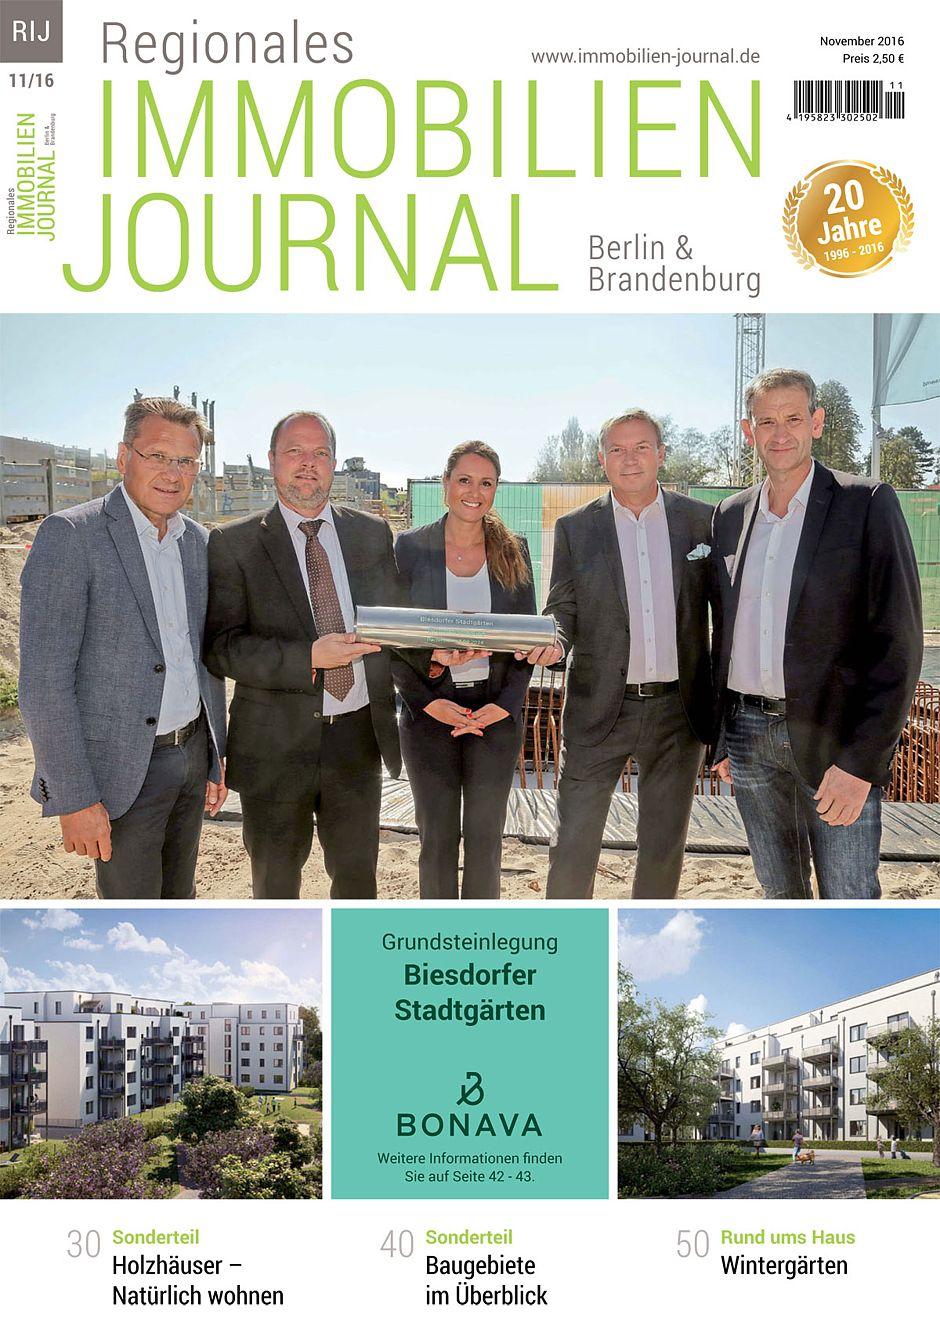 Regionales immobilien journal berlin brandenburg for Hausbaufirmen brandenburg